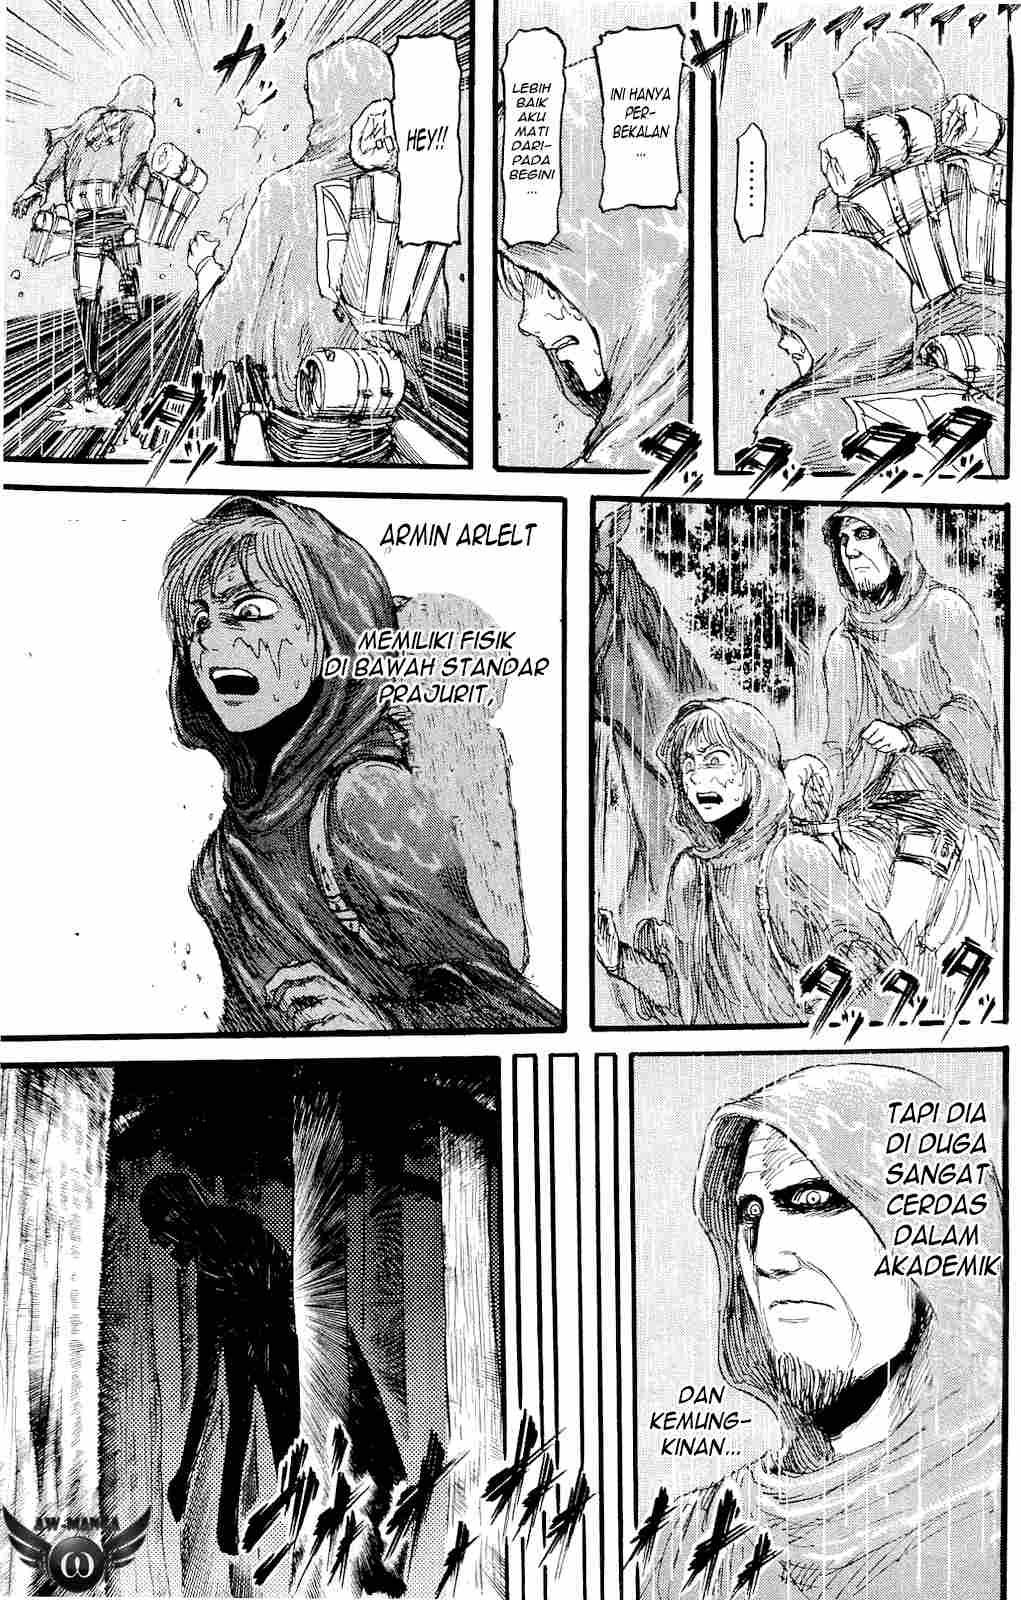 Komik shingeki no kyojin 018 - sekarang apa yang harus dilakukan 19 Indonesia shingeki no kyojin 018 - sekarang apa yang harus dilakukan Terbaru 4|Baca Manga Komik Indonesia|